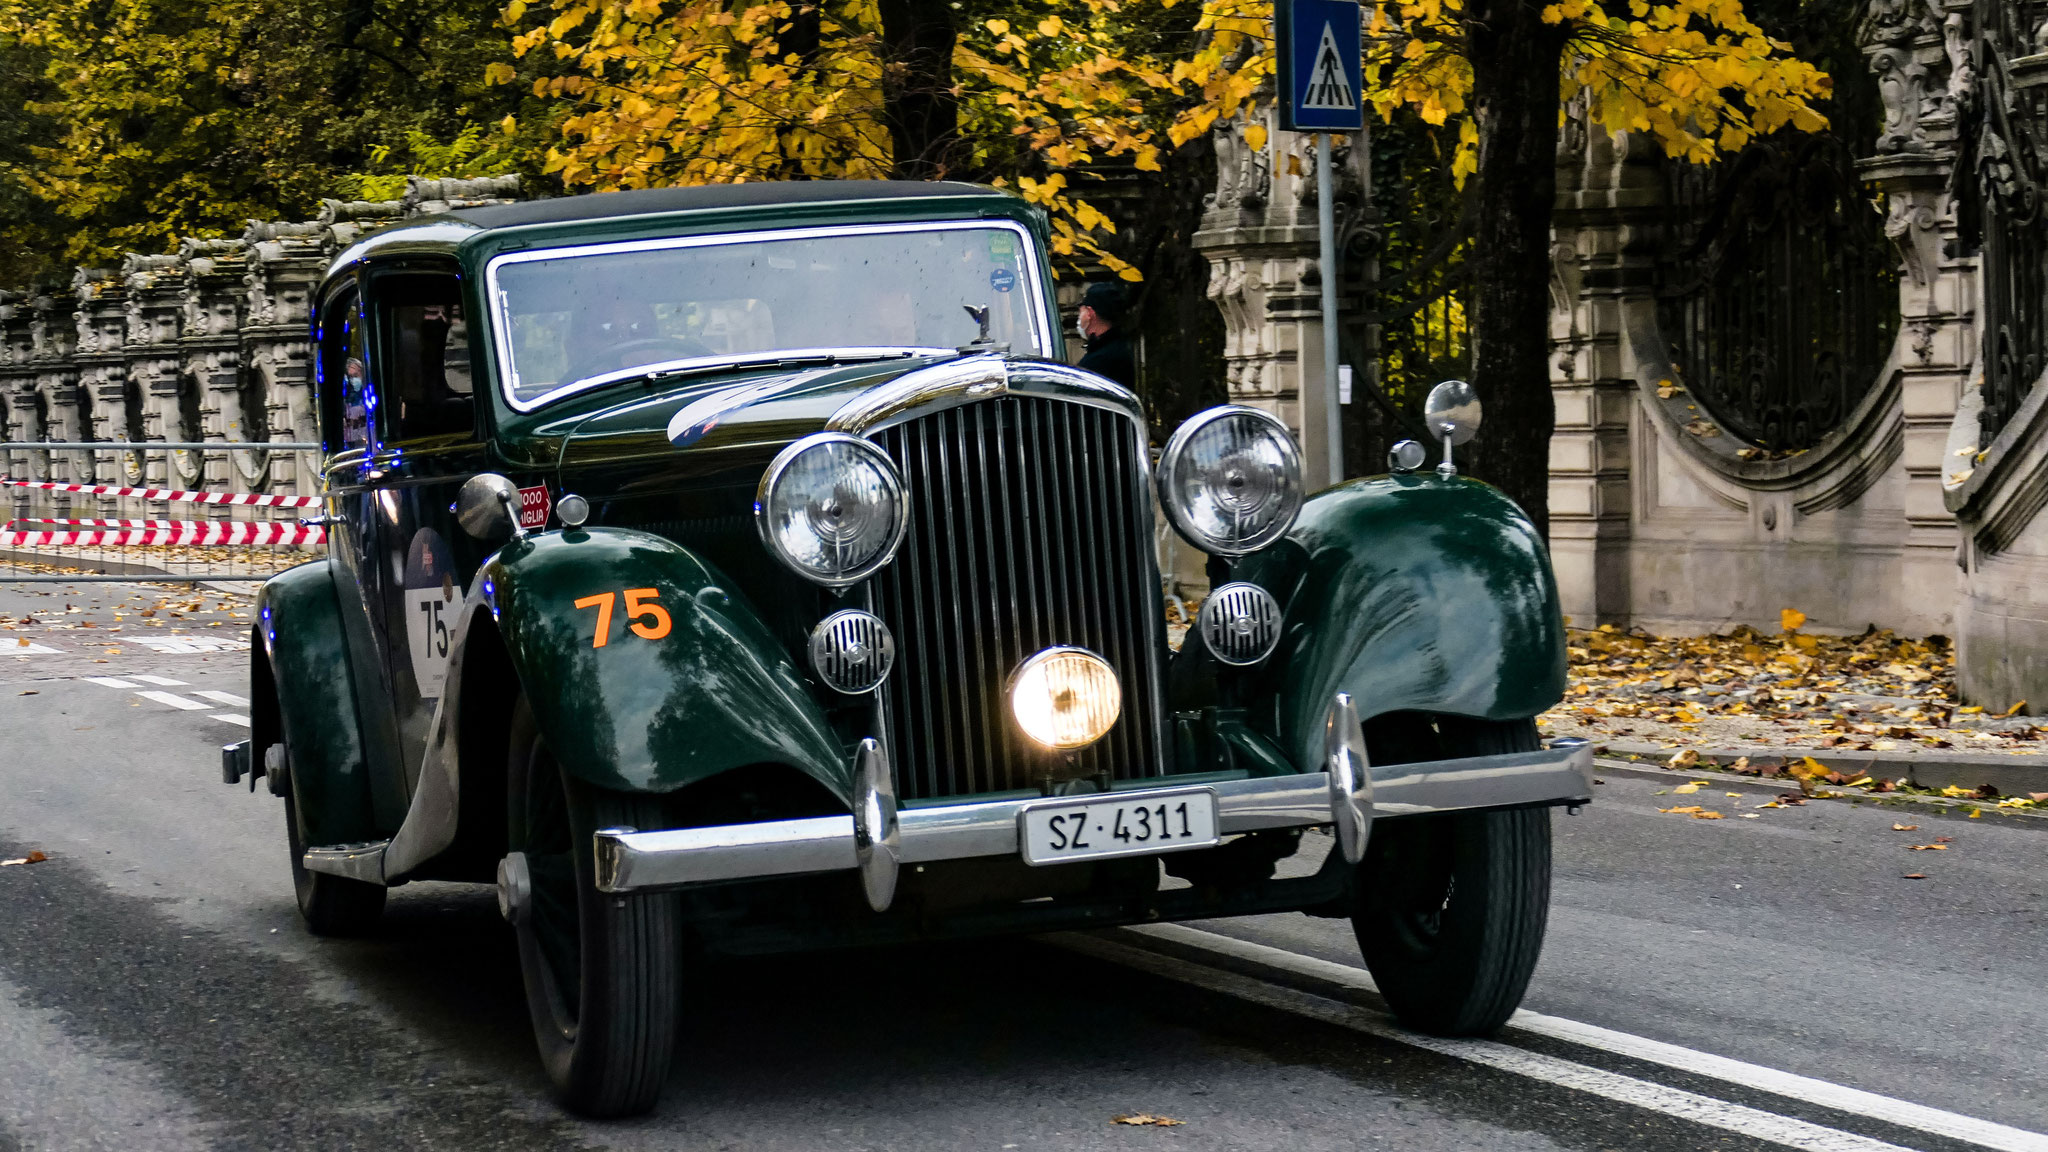 Bentley 3 1/2 Litre - SZ-4311 (CH)